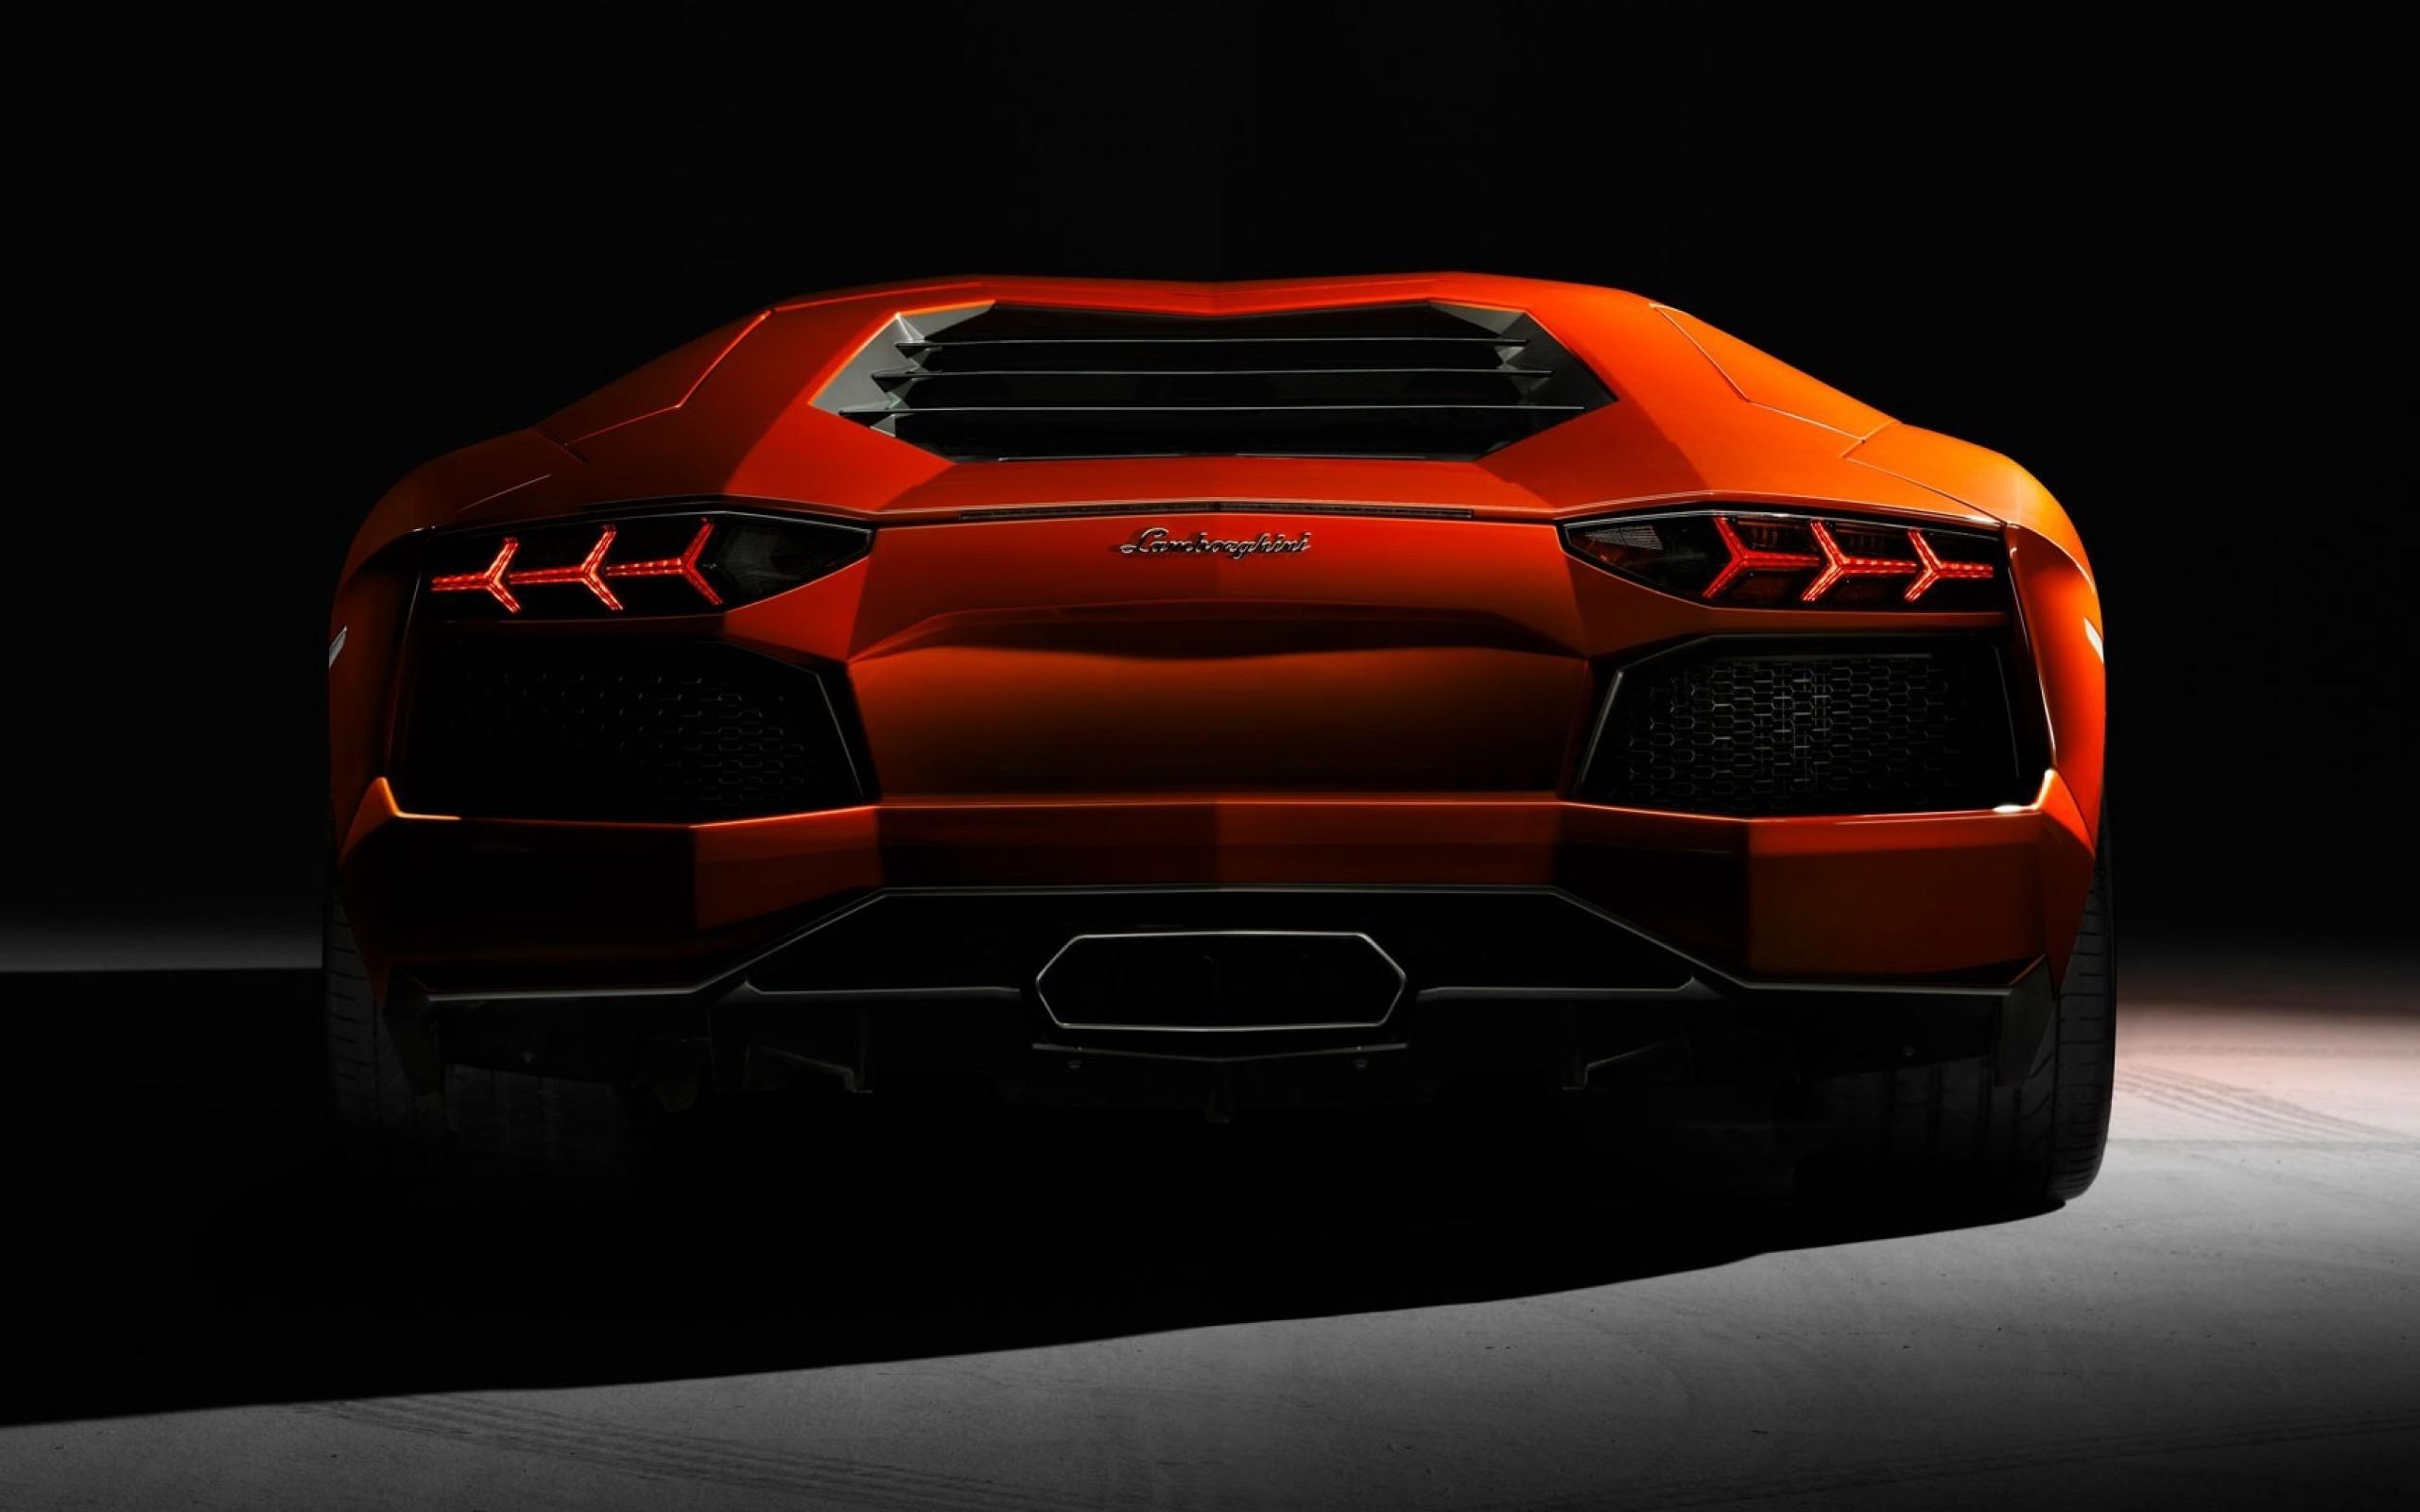 Lamborghini Aventador Wallpapers Pictures Images